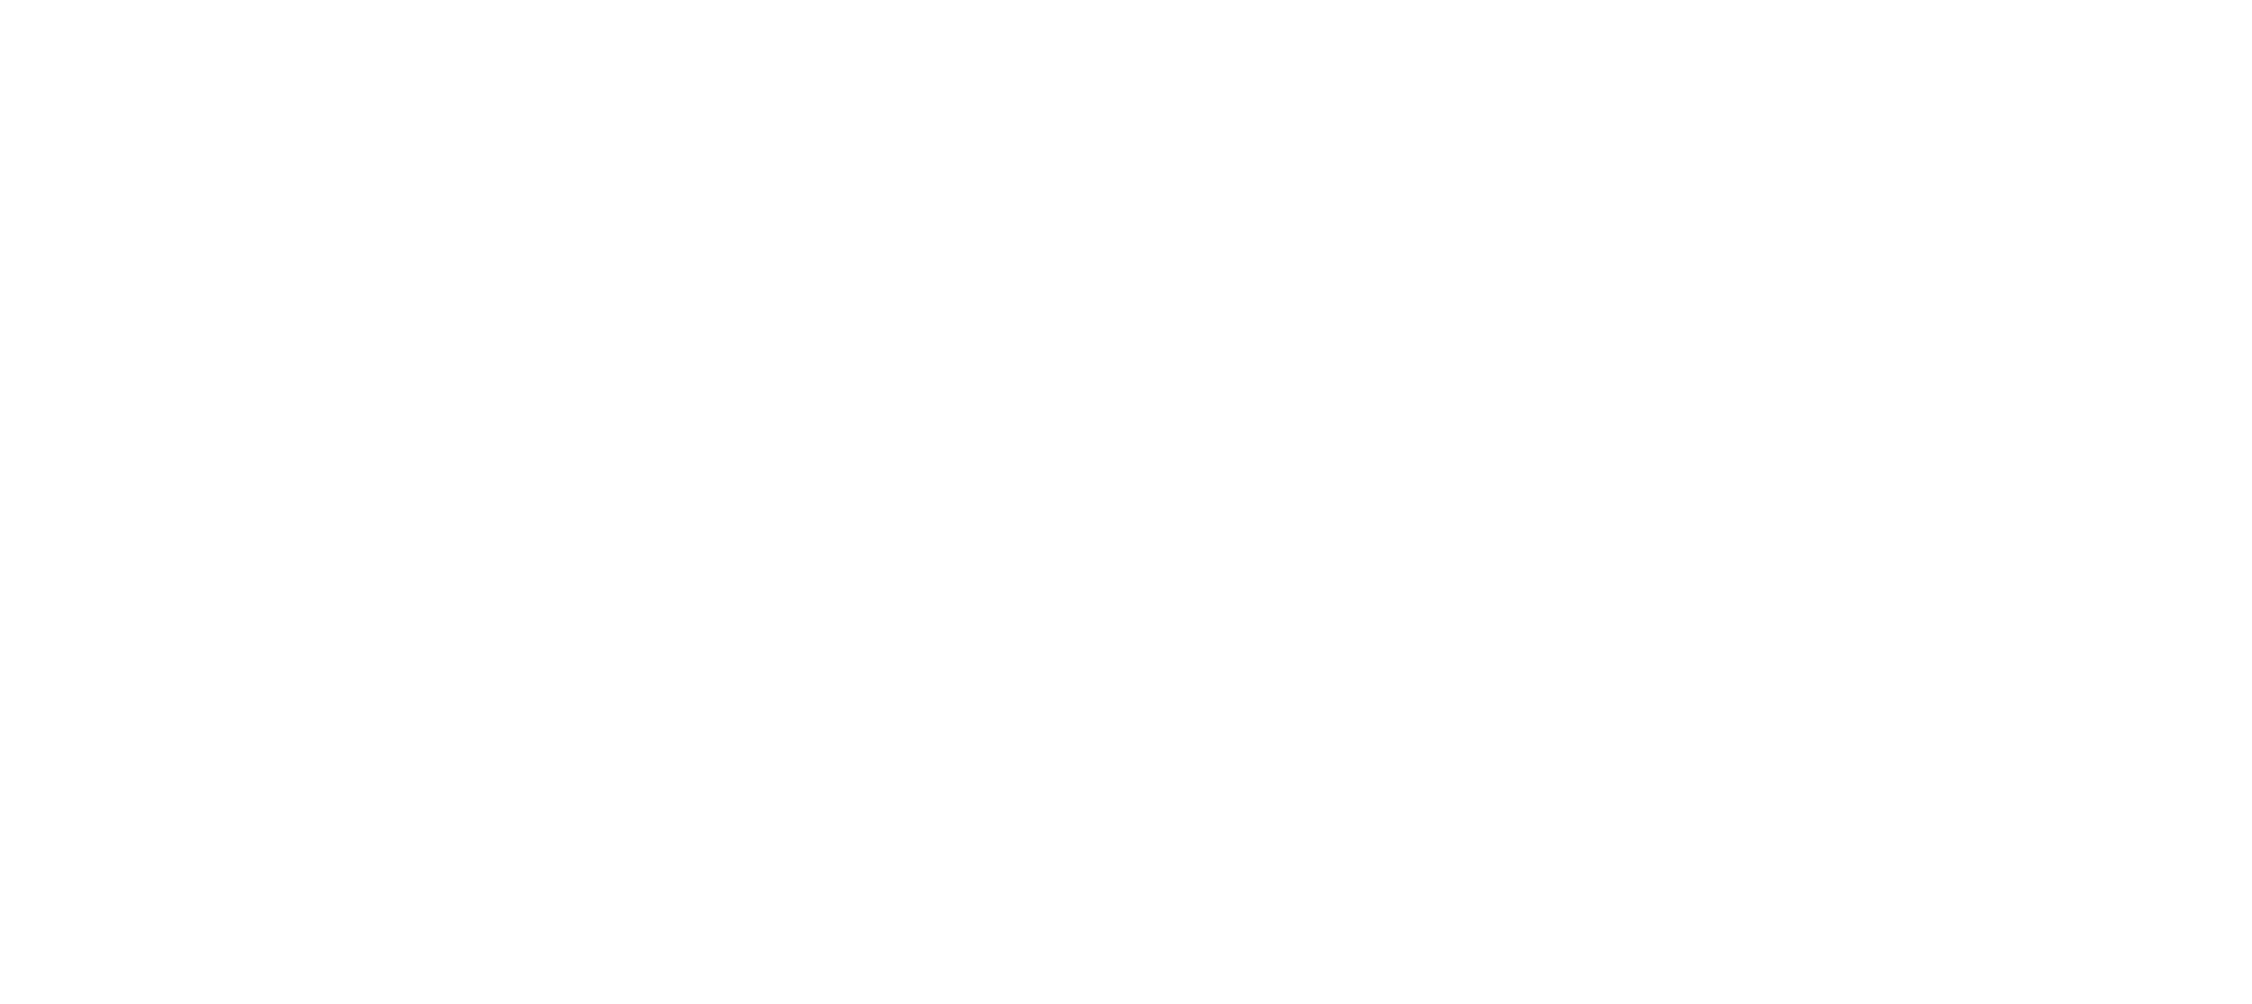 FRI 9/20 - Port Townsend Film Festival - Port Townsend, WA   More Info coming soon!